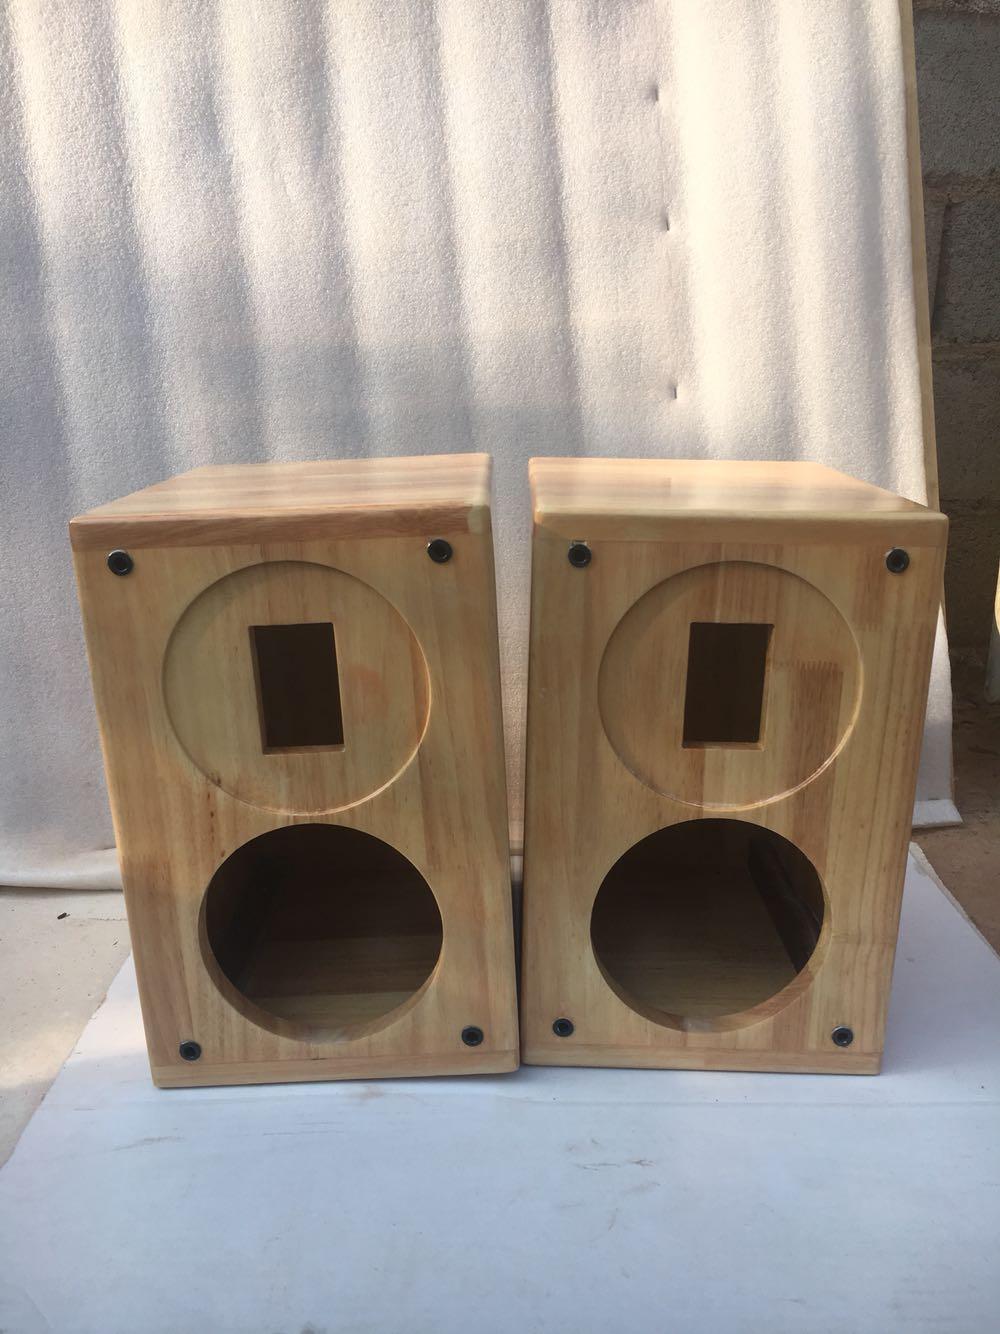 Fixed solid wood sound box 45 inch 6.5 inch 8 inch full frequency two frequency HiFi bookshelf DIY high fidelity feverish empty box